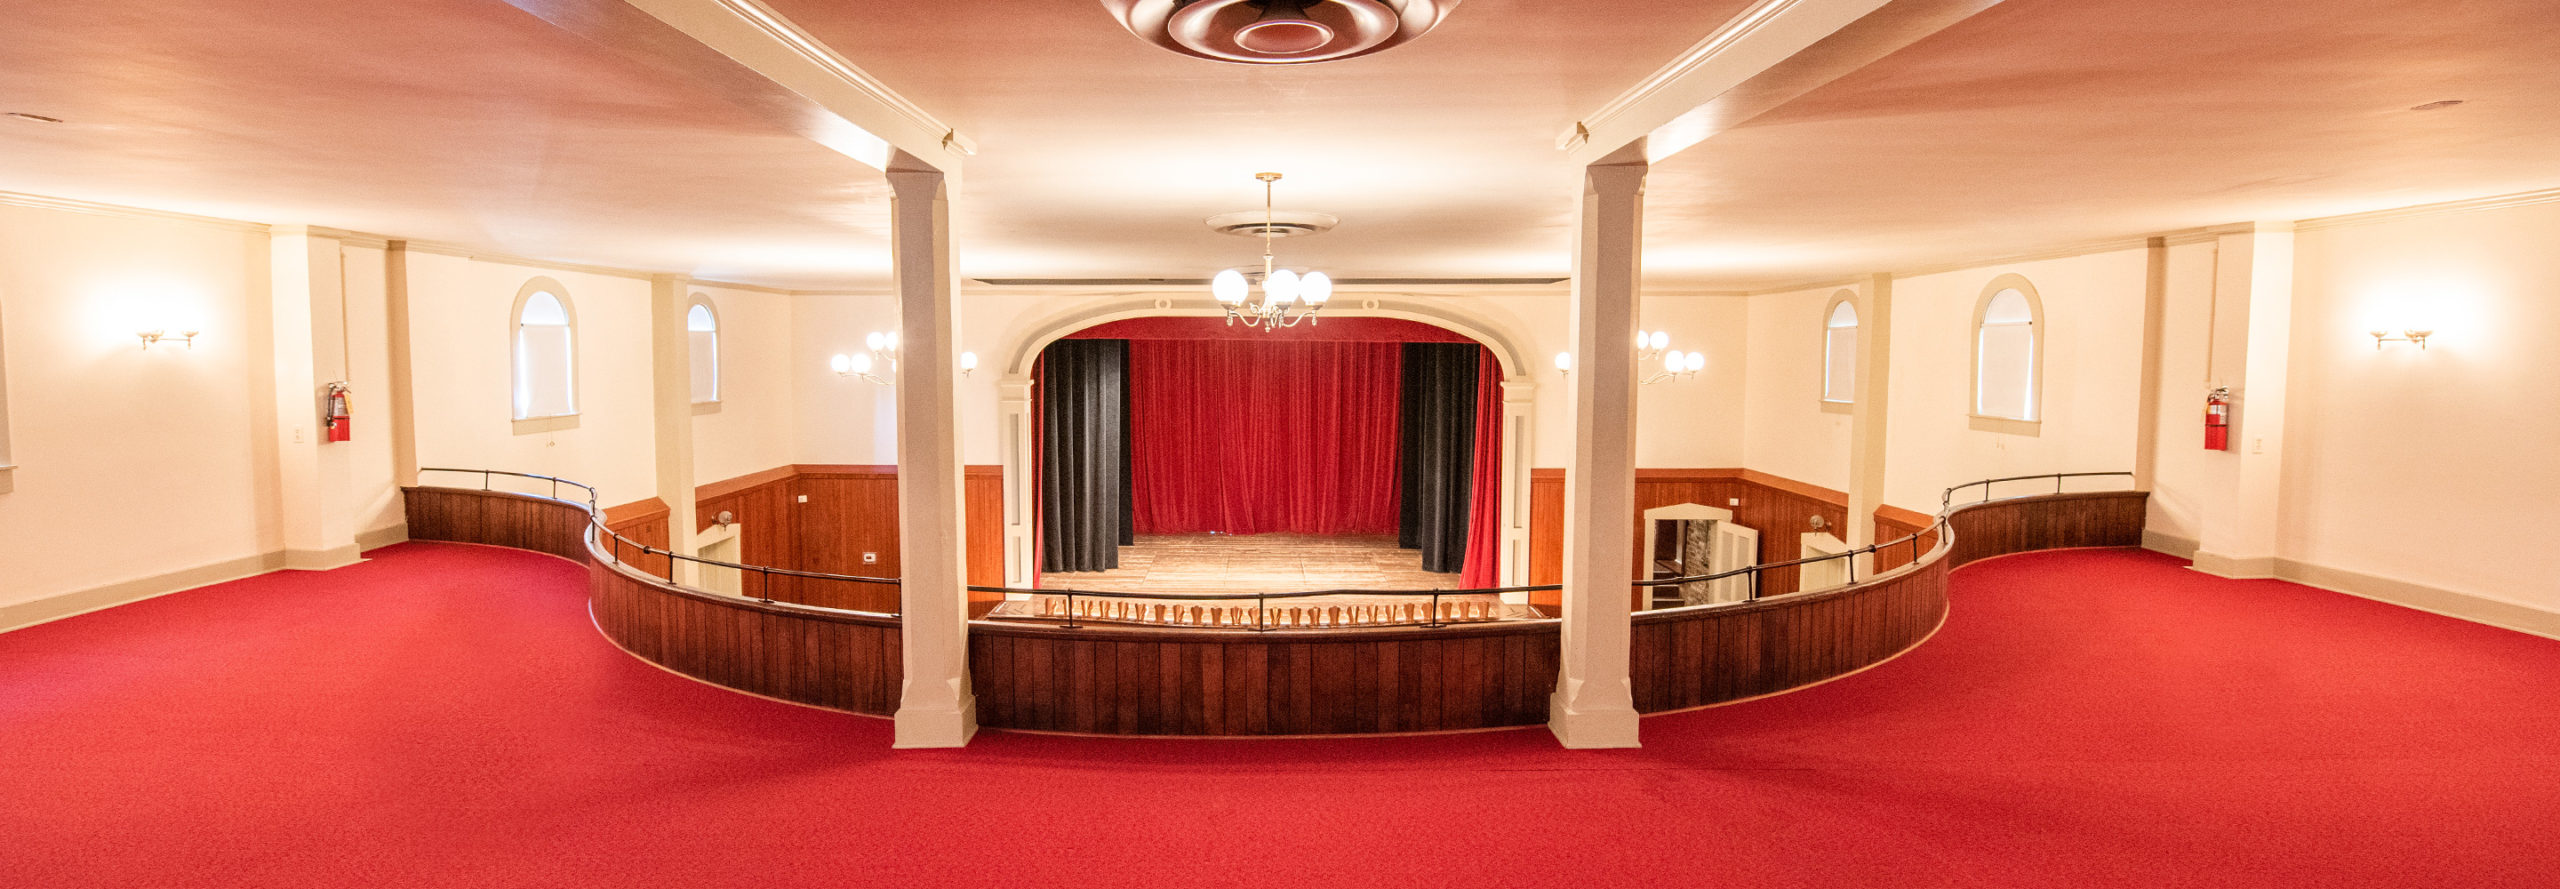 Thrall's Opera House